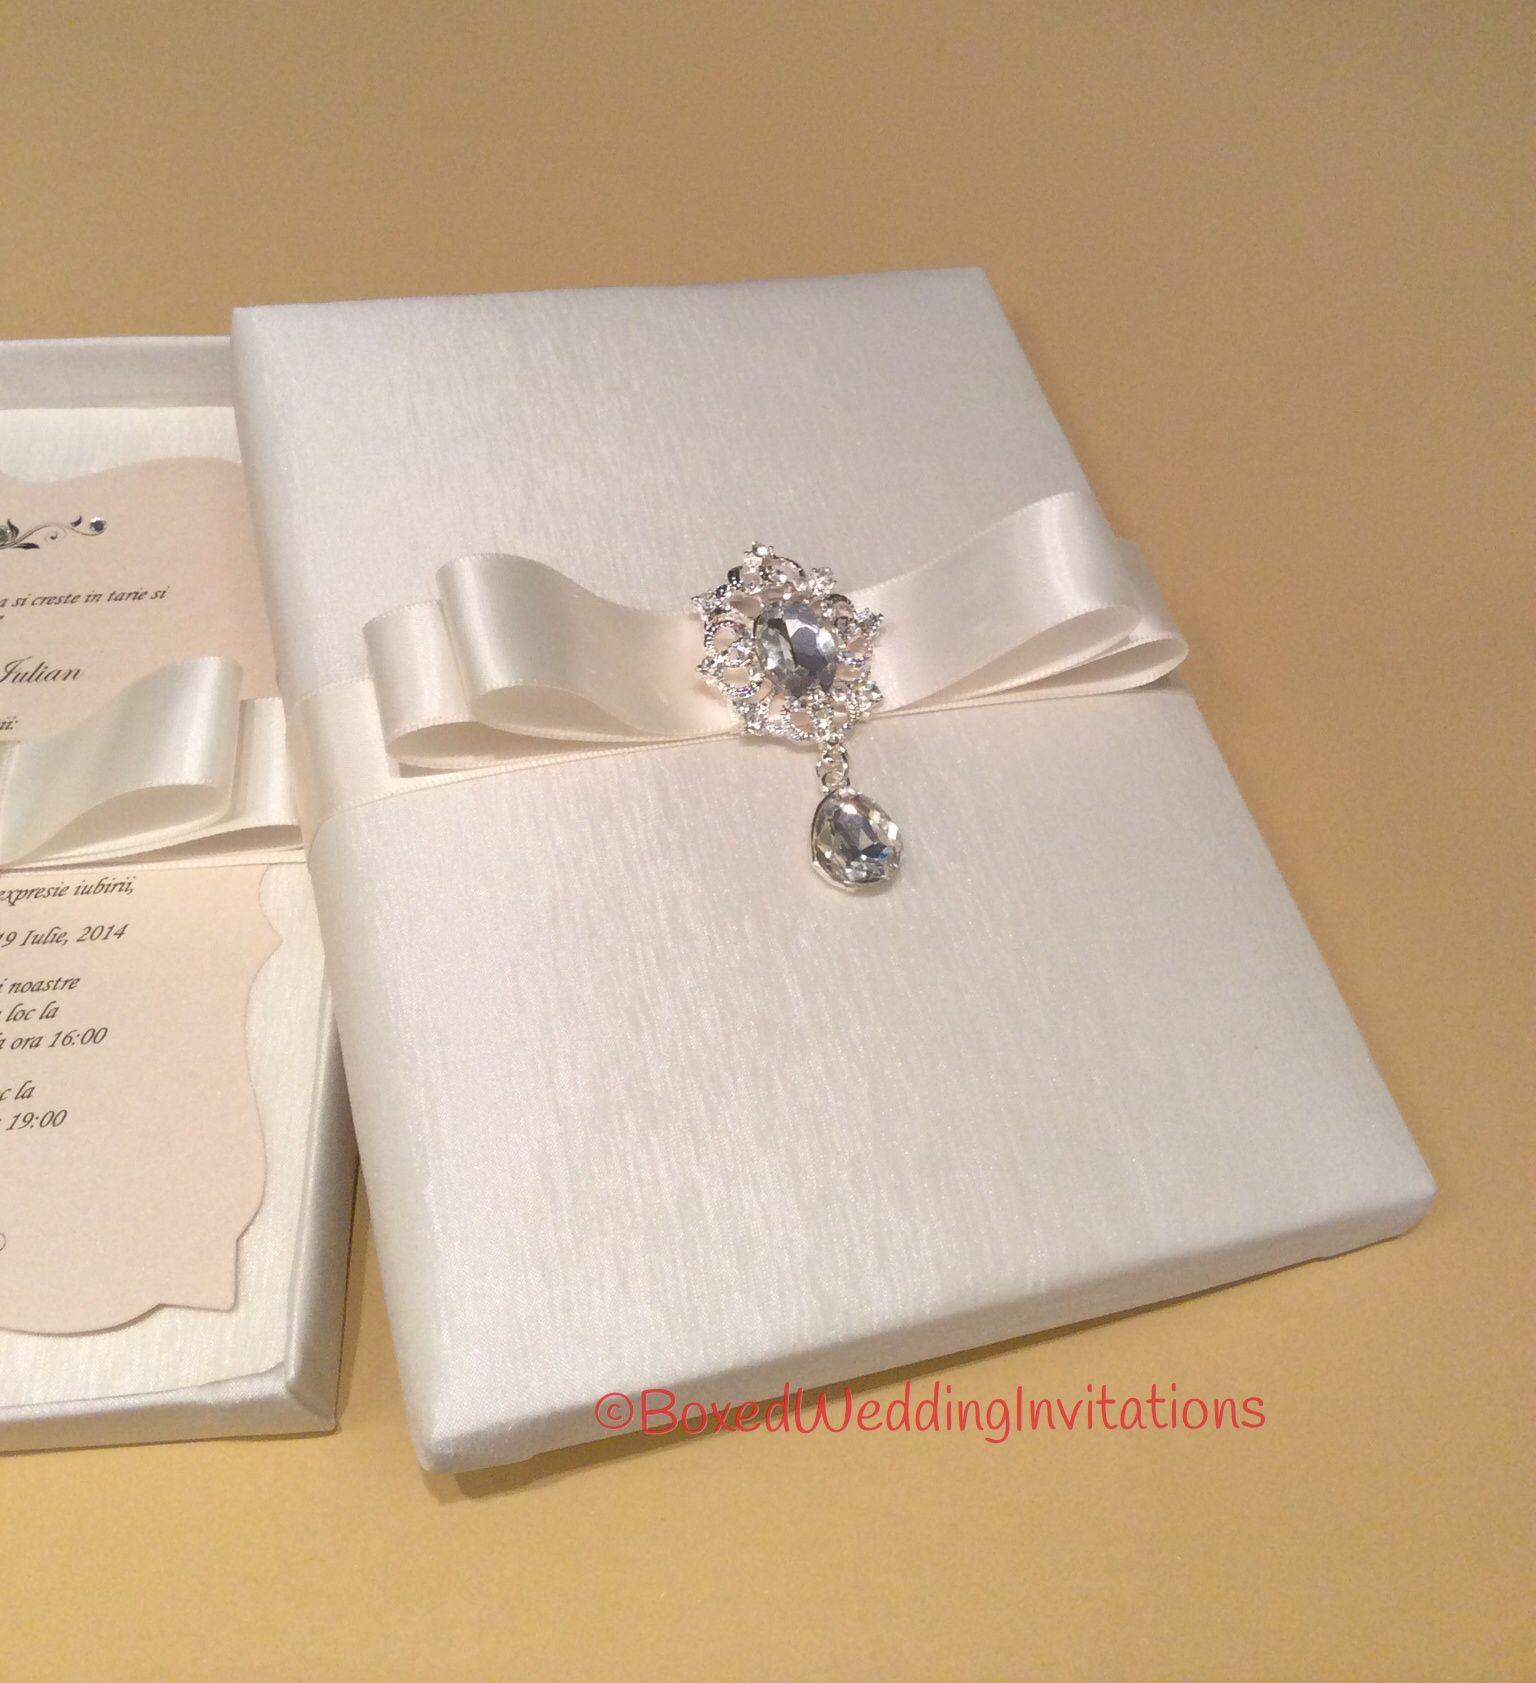 Dangling Crystal Wedding Invitation Box   Pinterest   Crystal ...